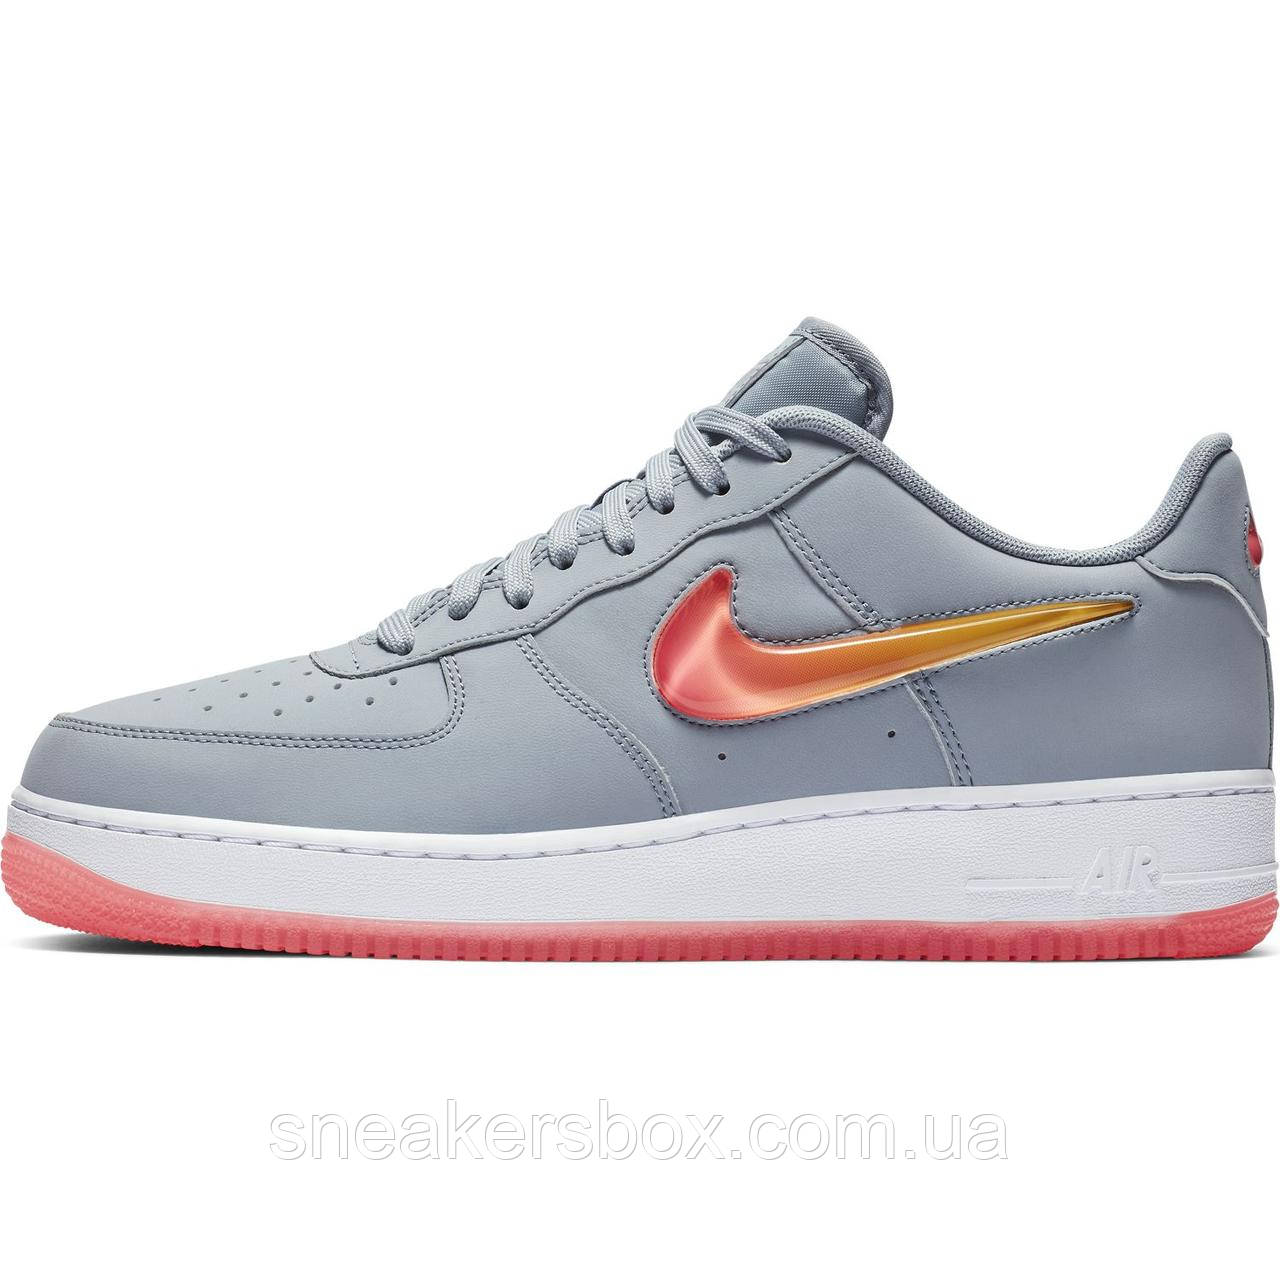 dbcb66d8 Оригинальные кроссовки Nike Air Force 1 '07 PRM 2 (AT4143-400), цена ...